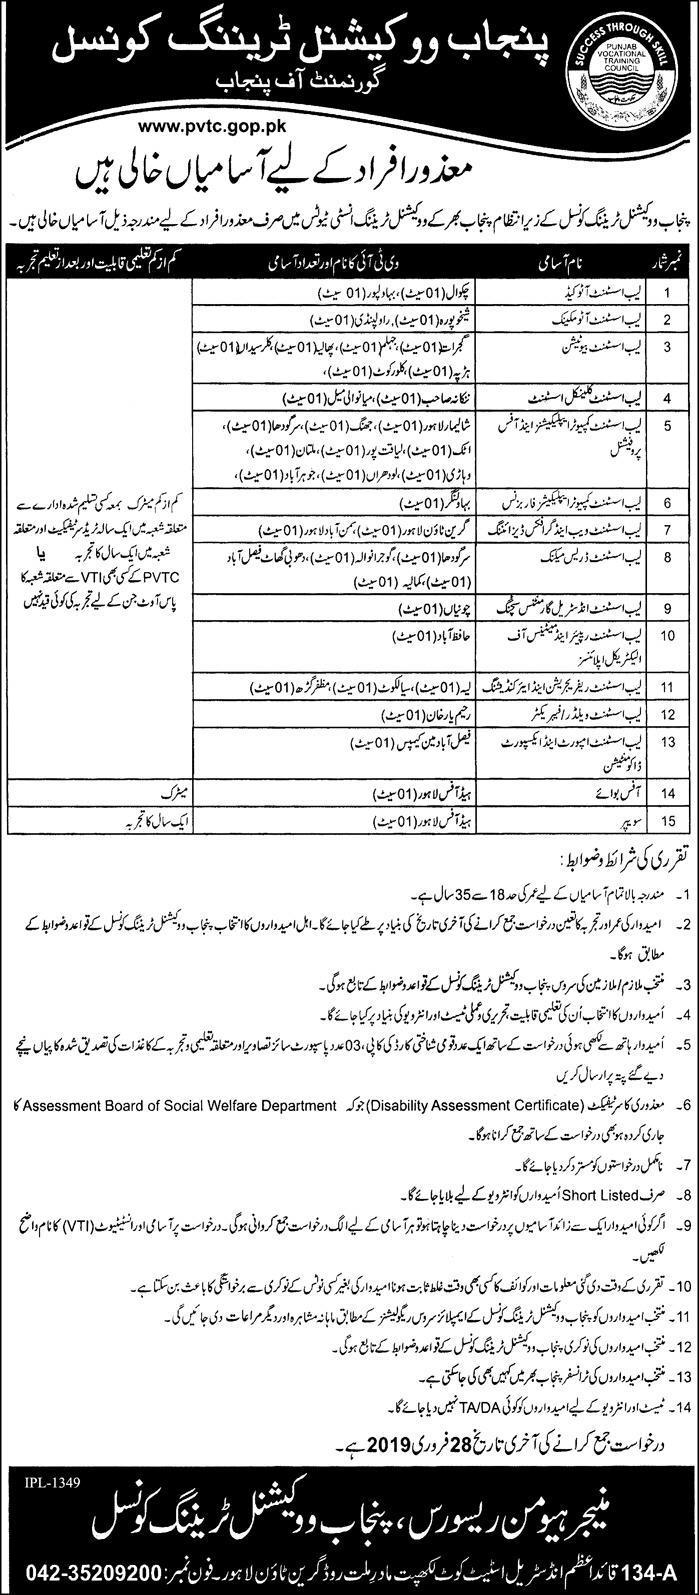 Punjab Vocational Training Council PVTC Jobs 2019 Application Form Download